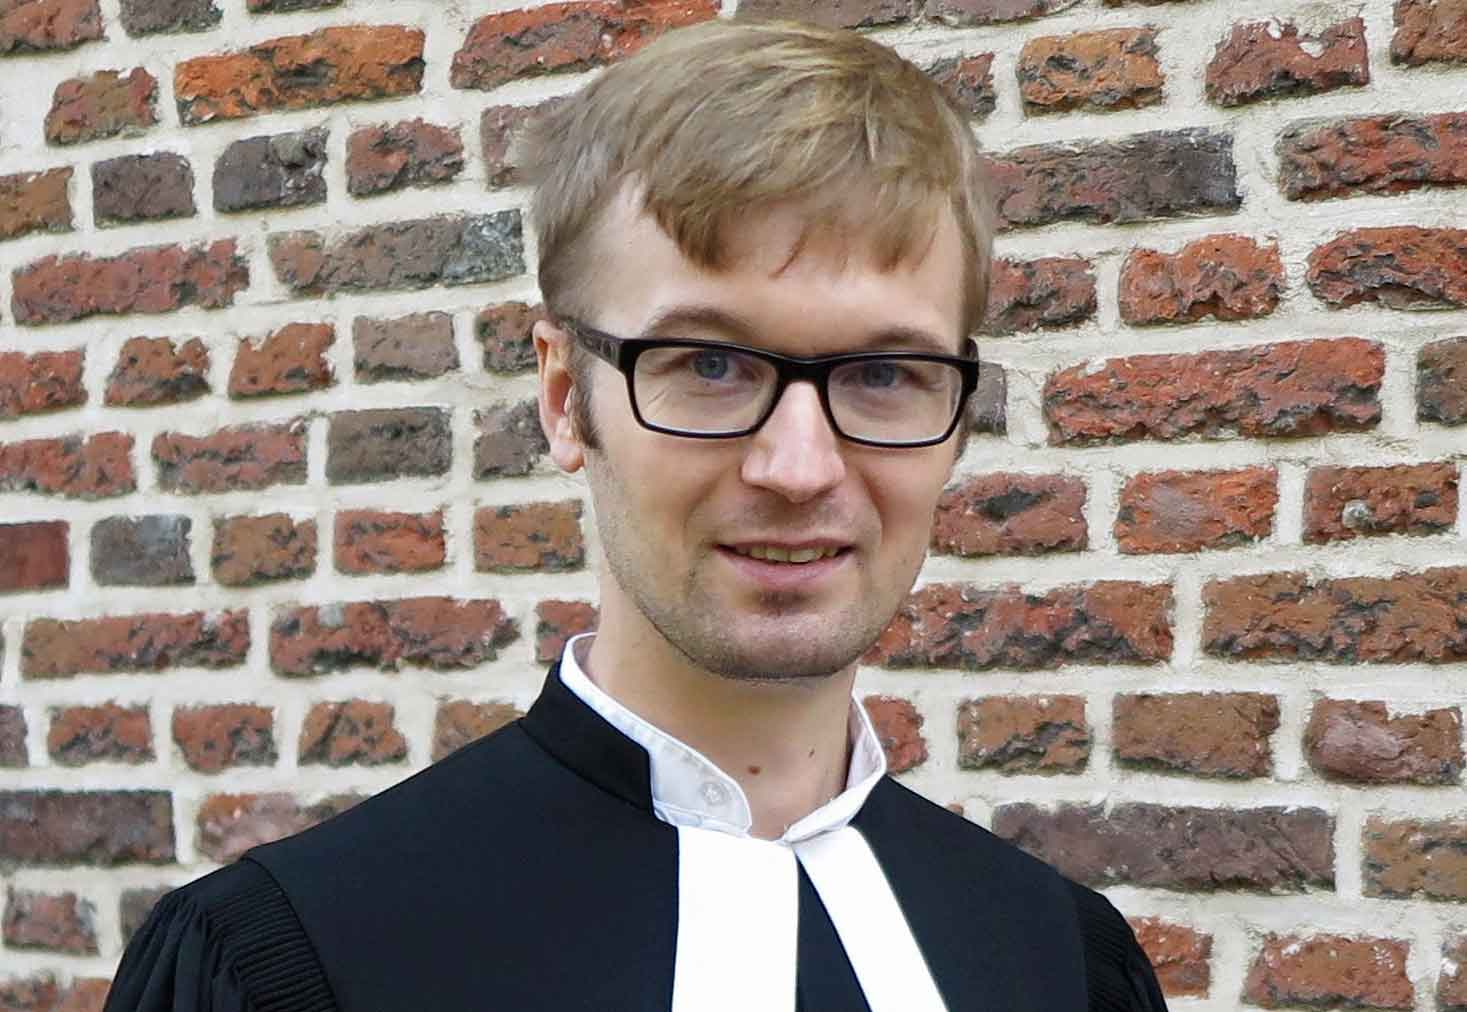 Pfarrer-Daniel-Wiegmann-Gahlen